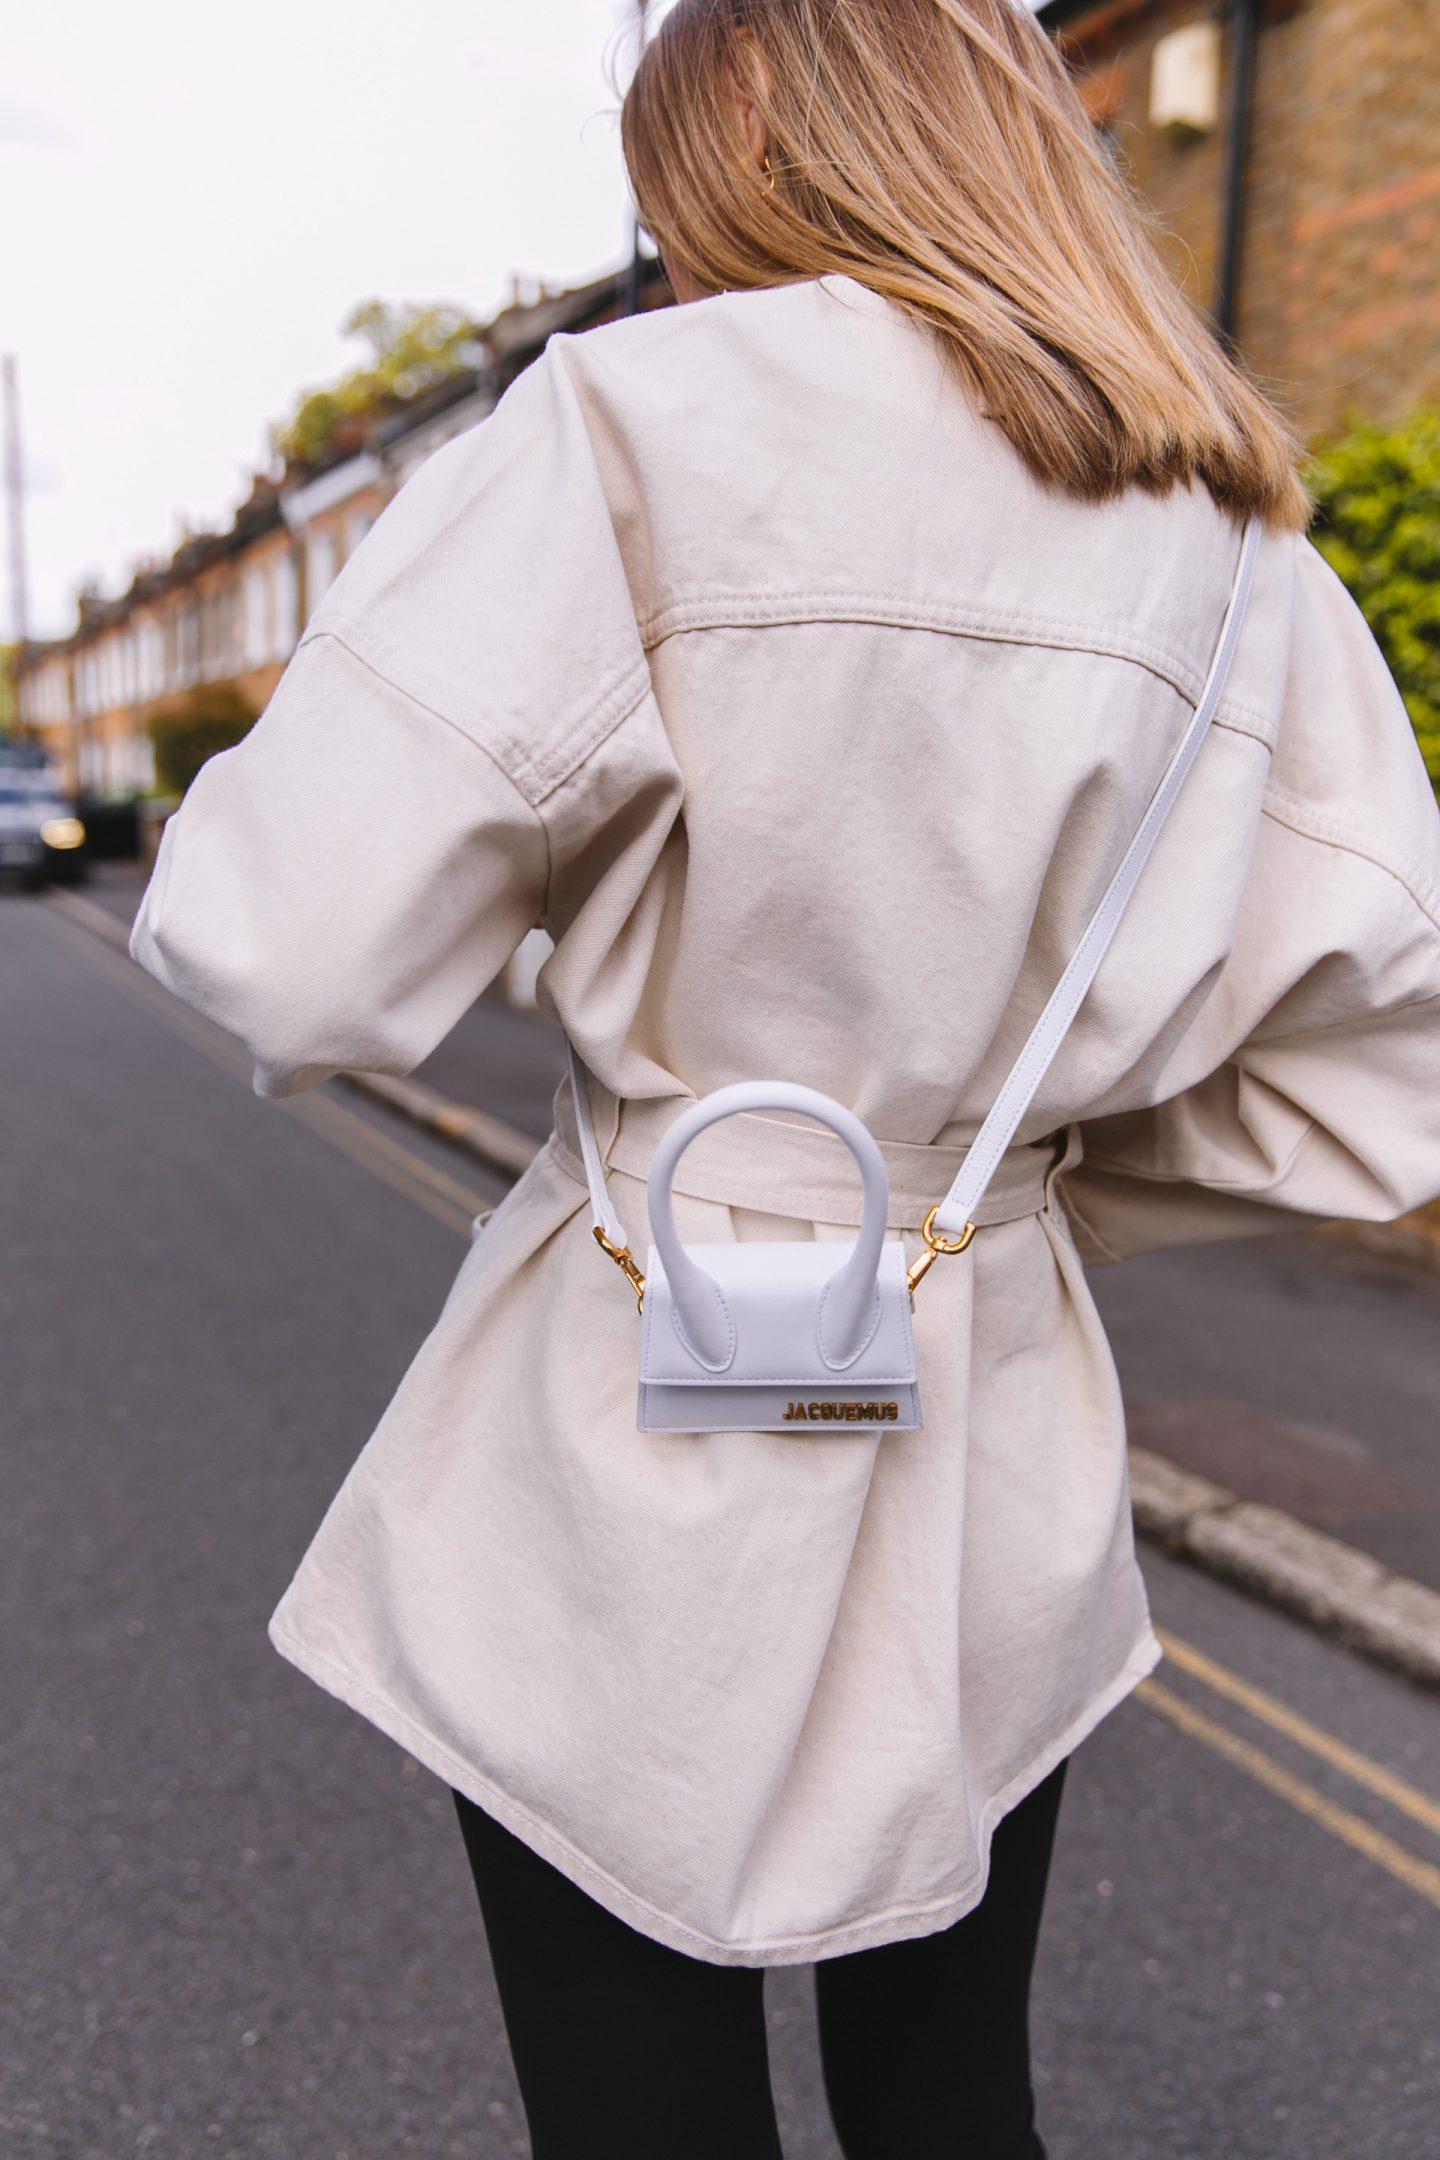 Safari jacket paired jacquemus bag